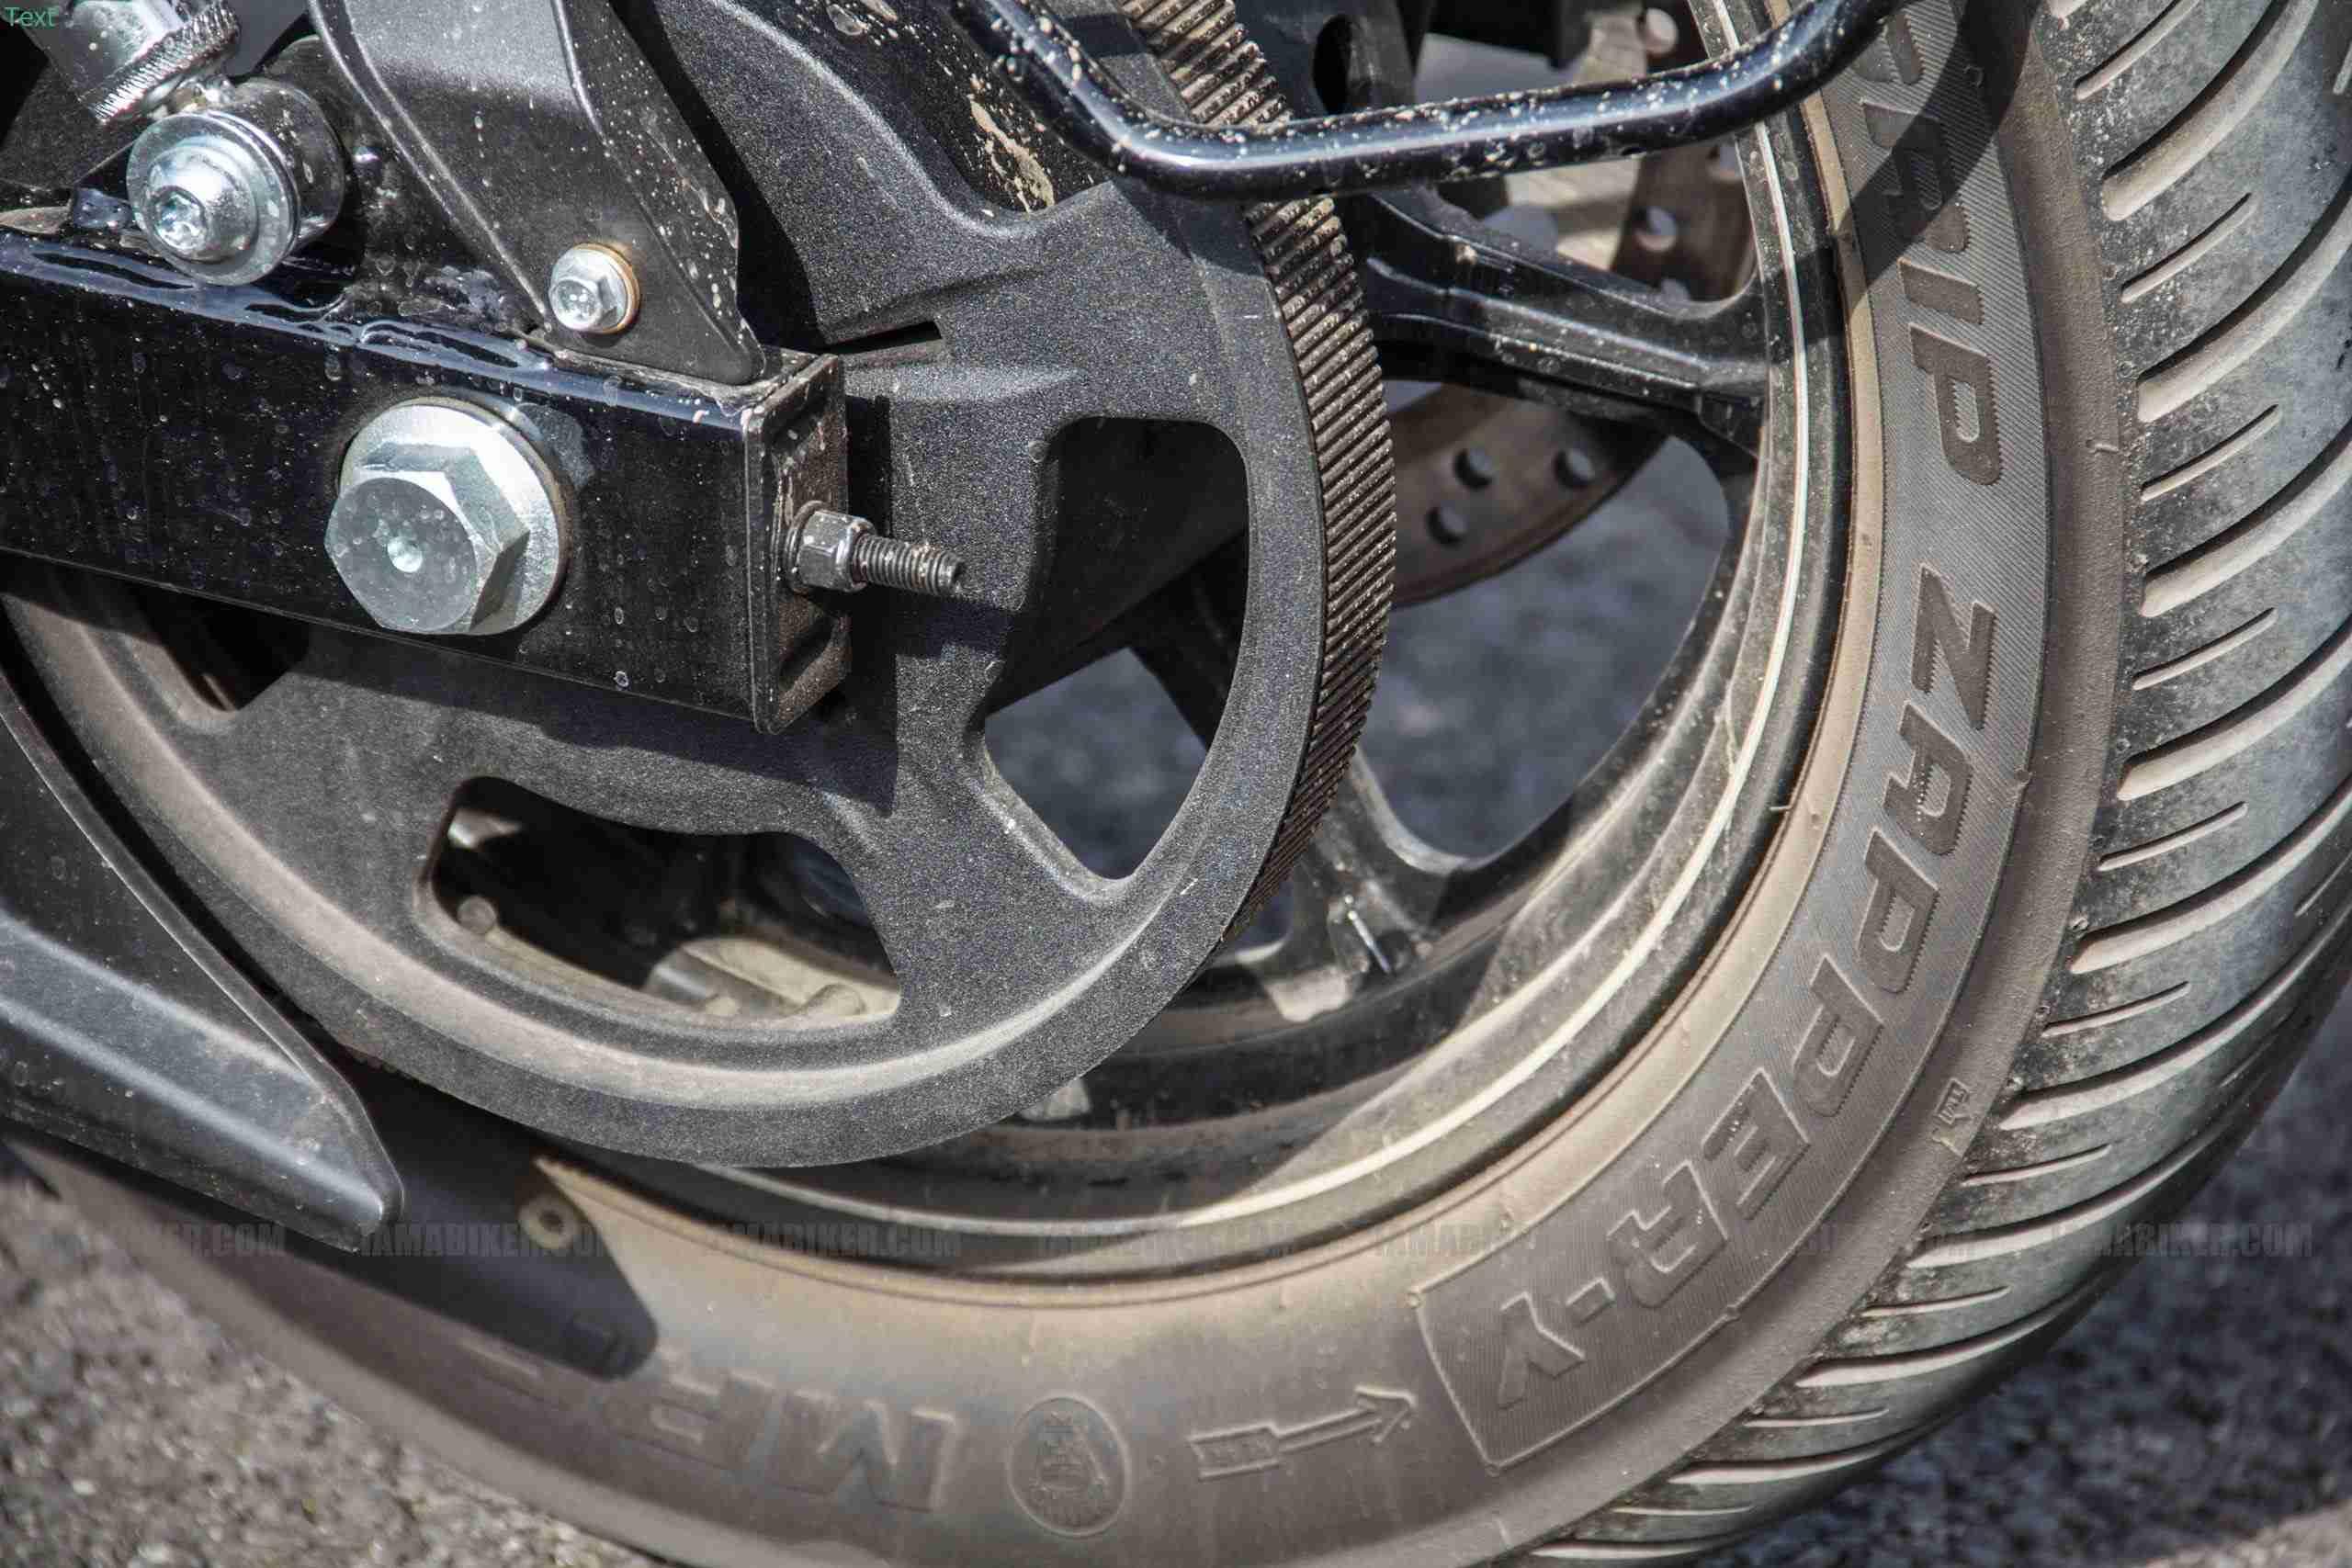 2015 Harley Davidson Street 750 review - 21